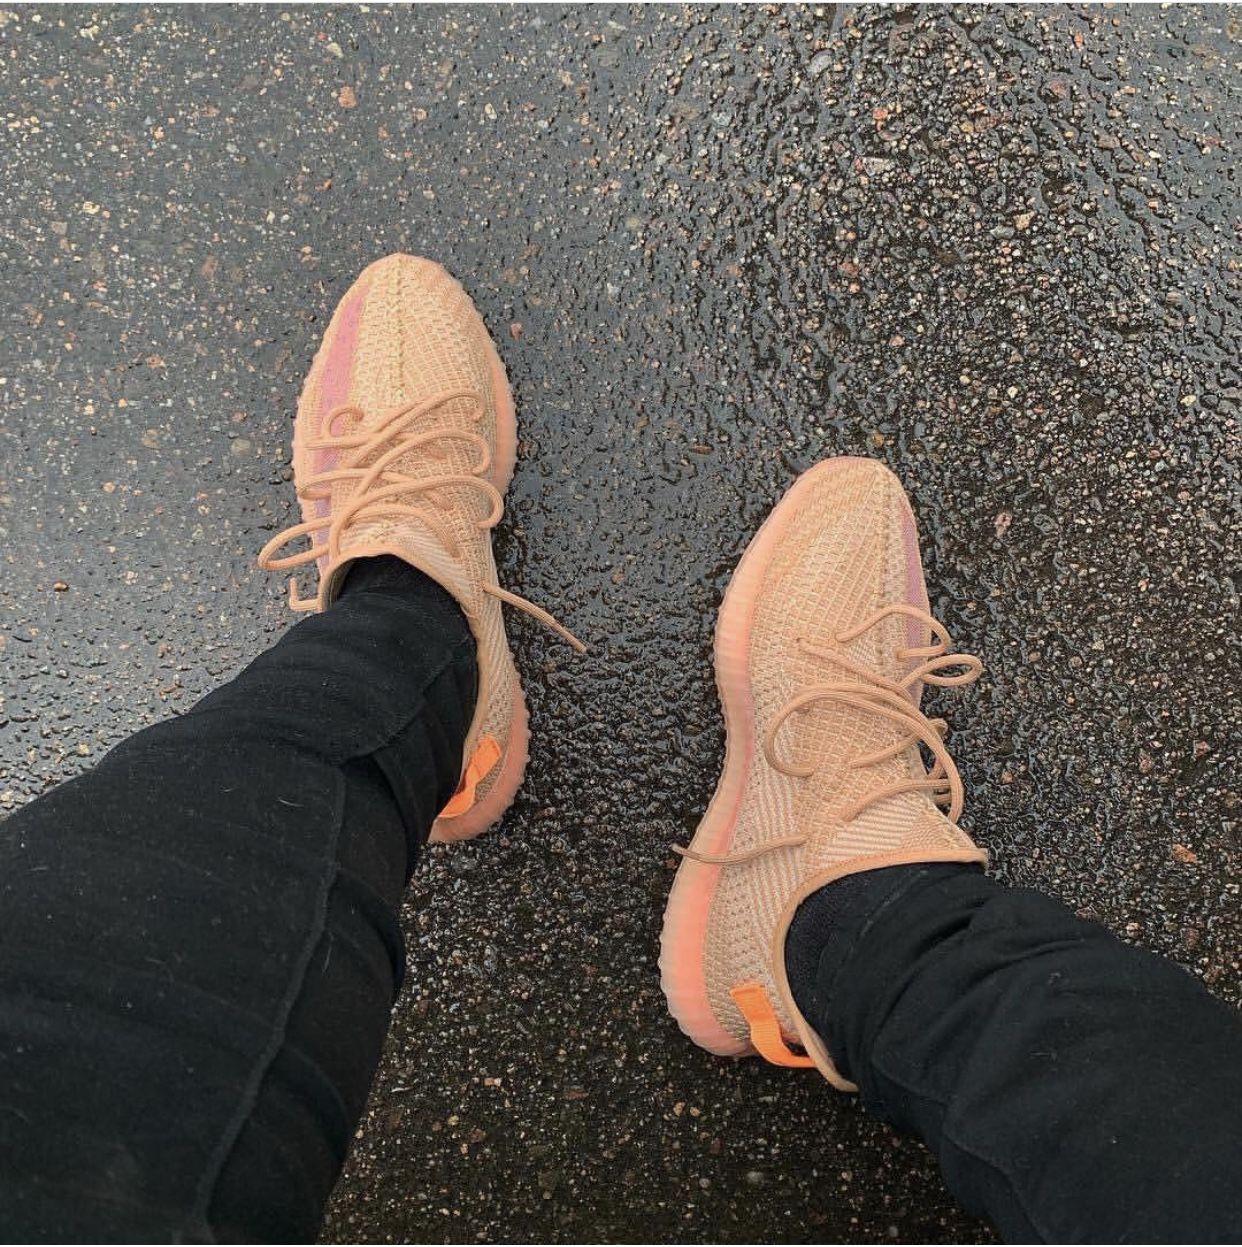 Pin by 𝑲á𝒚𝒚 𝑲𝒆𝒏𝒛𝒐 🐯 on Kicks Jordans, Adidas yeezy boost